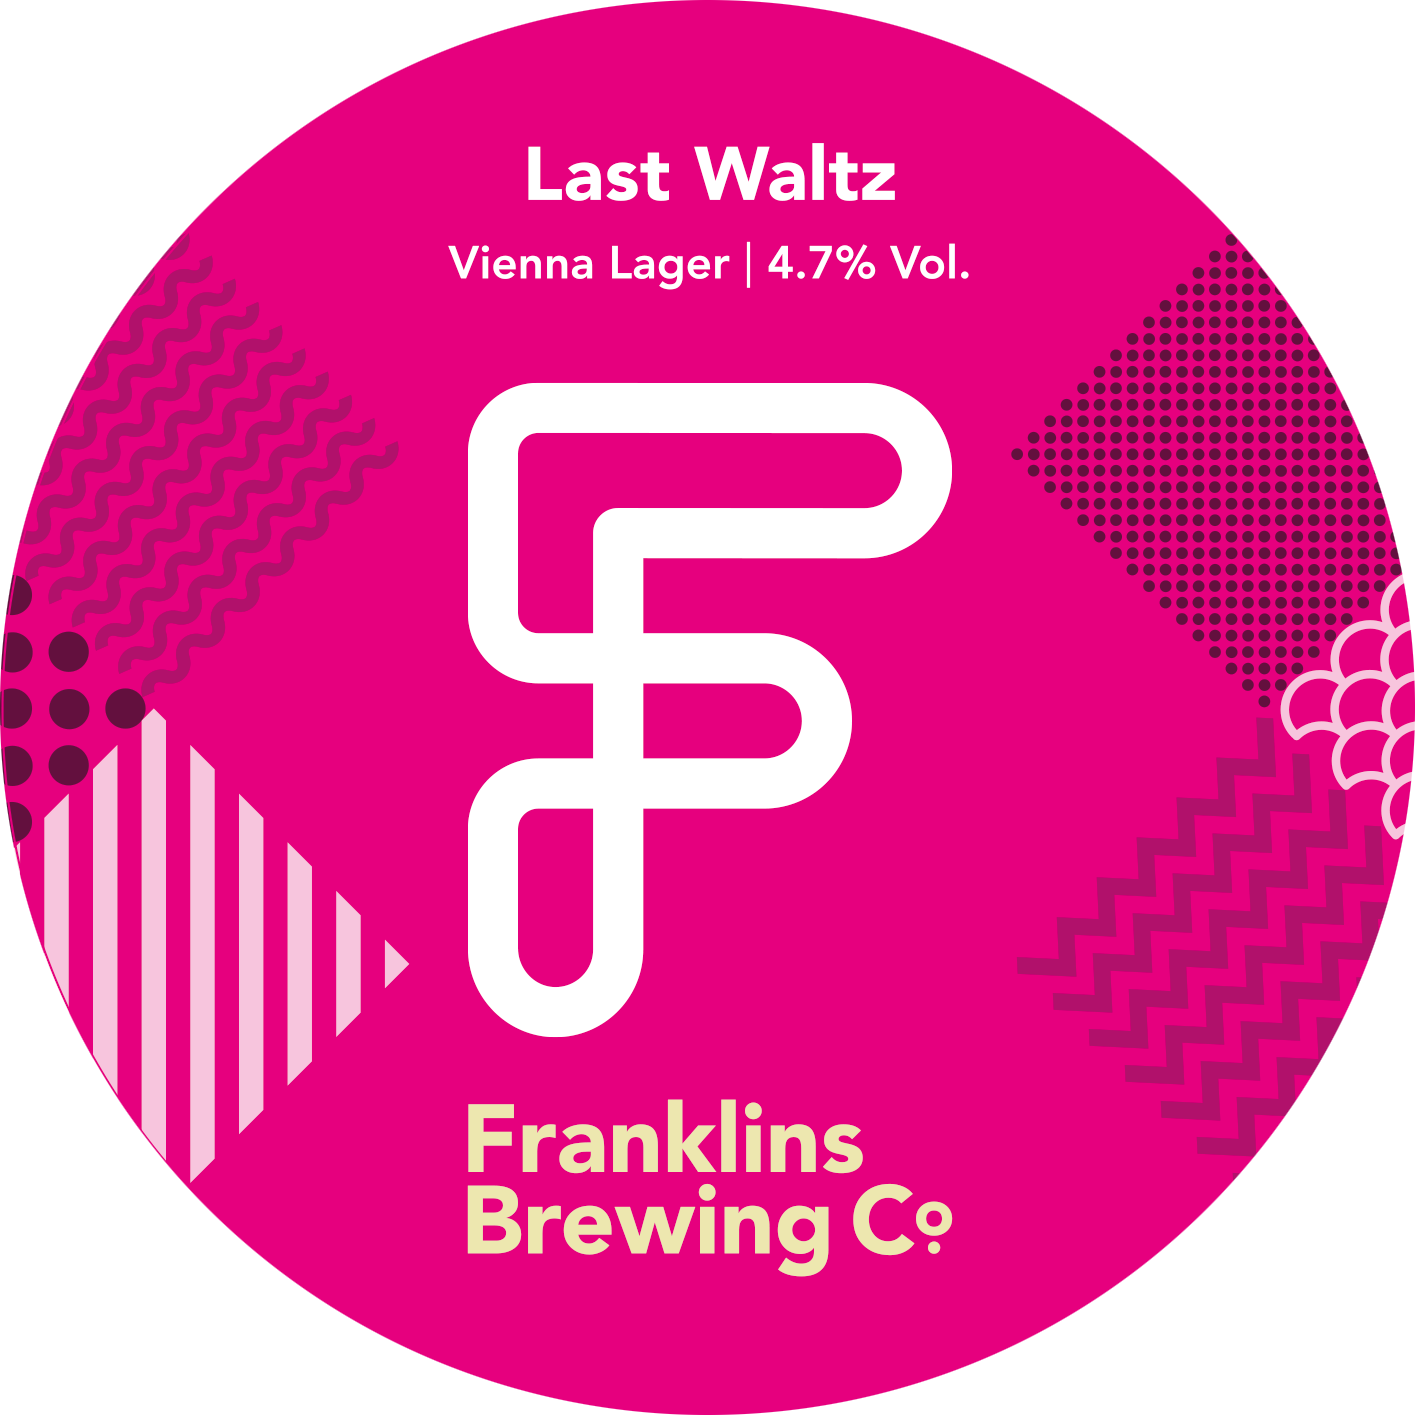 Franklins-Brewing-Co-Last-Waltz-Keg-Clip.png